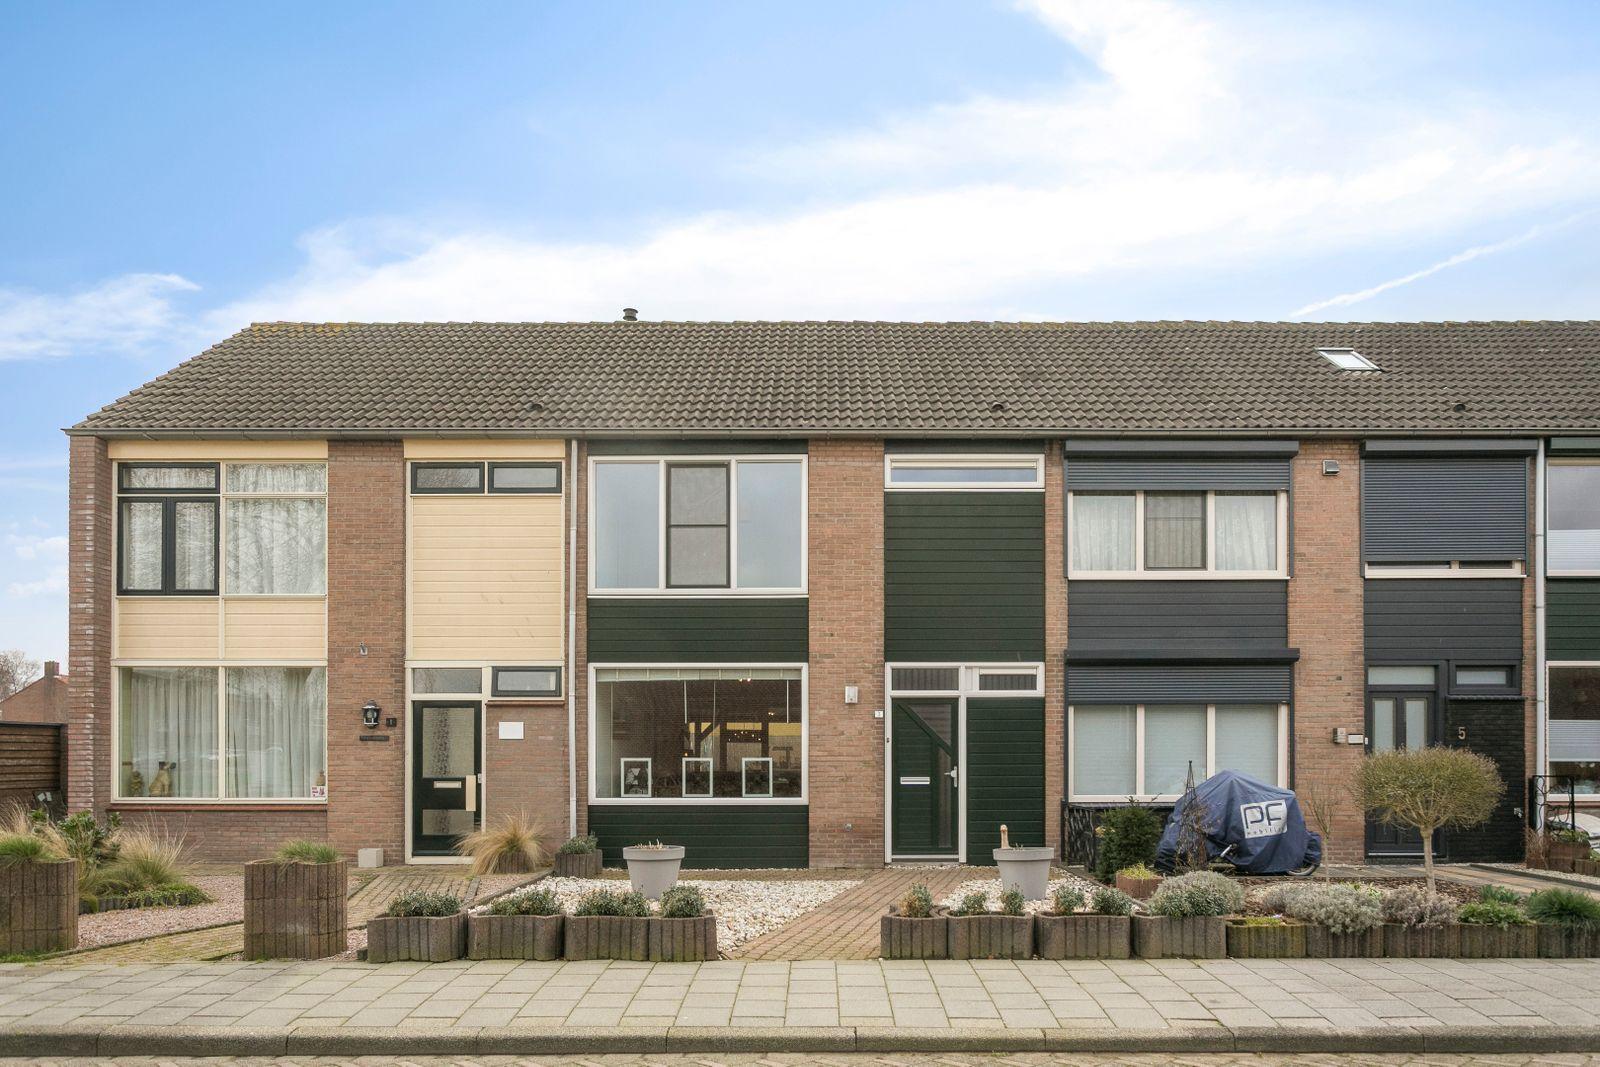 Frans Halsstraat 3, Zaltbommel